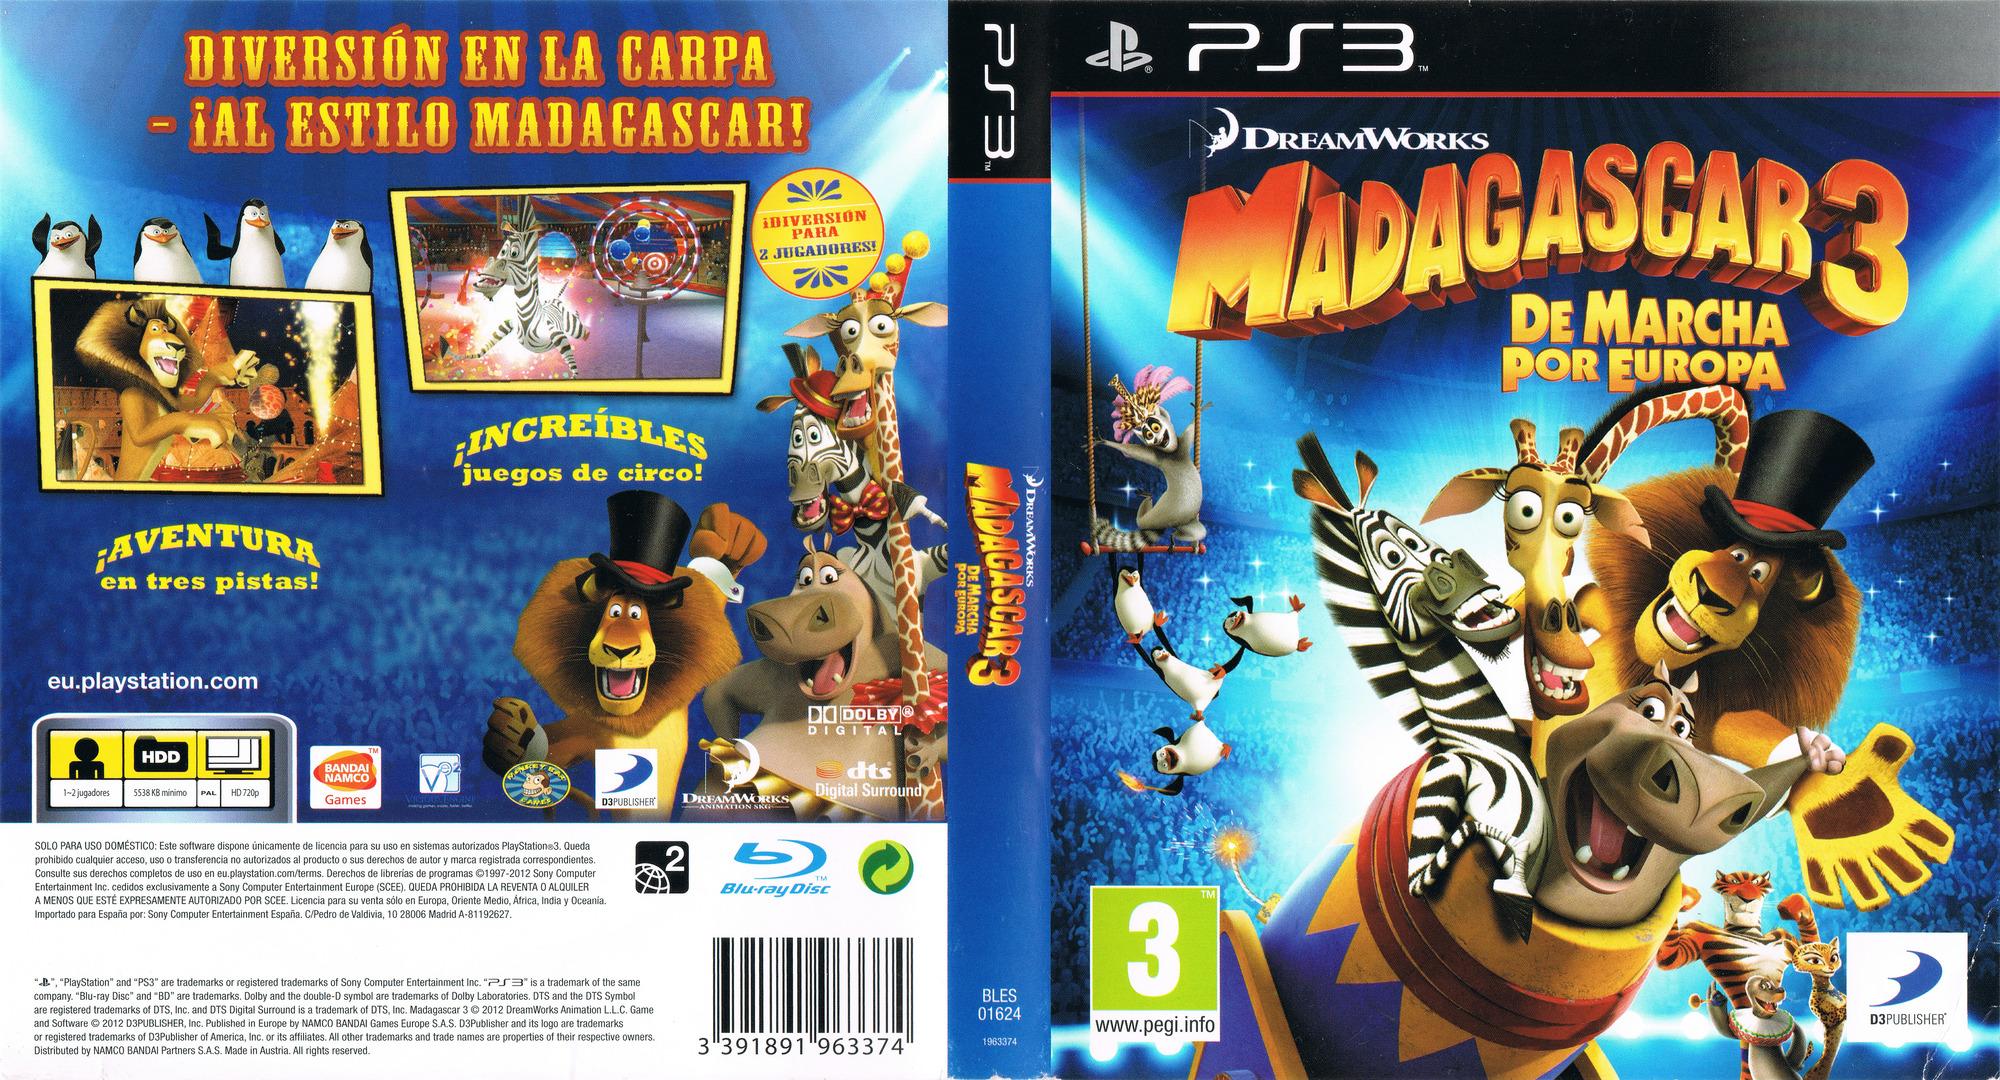 Madagascar 3: De Marcha por Europa PS3 coverfullHQ (BLES01624)